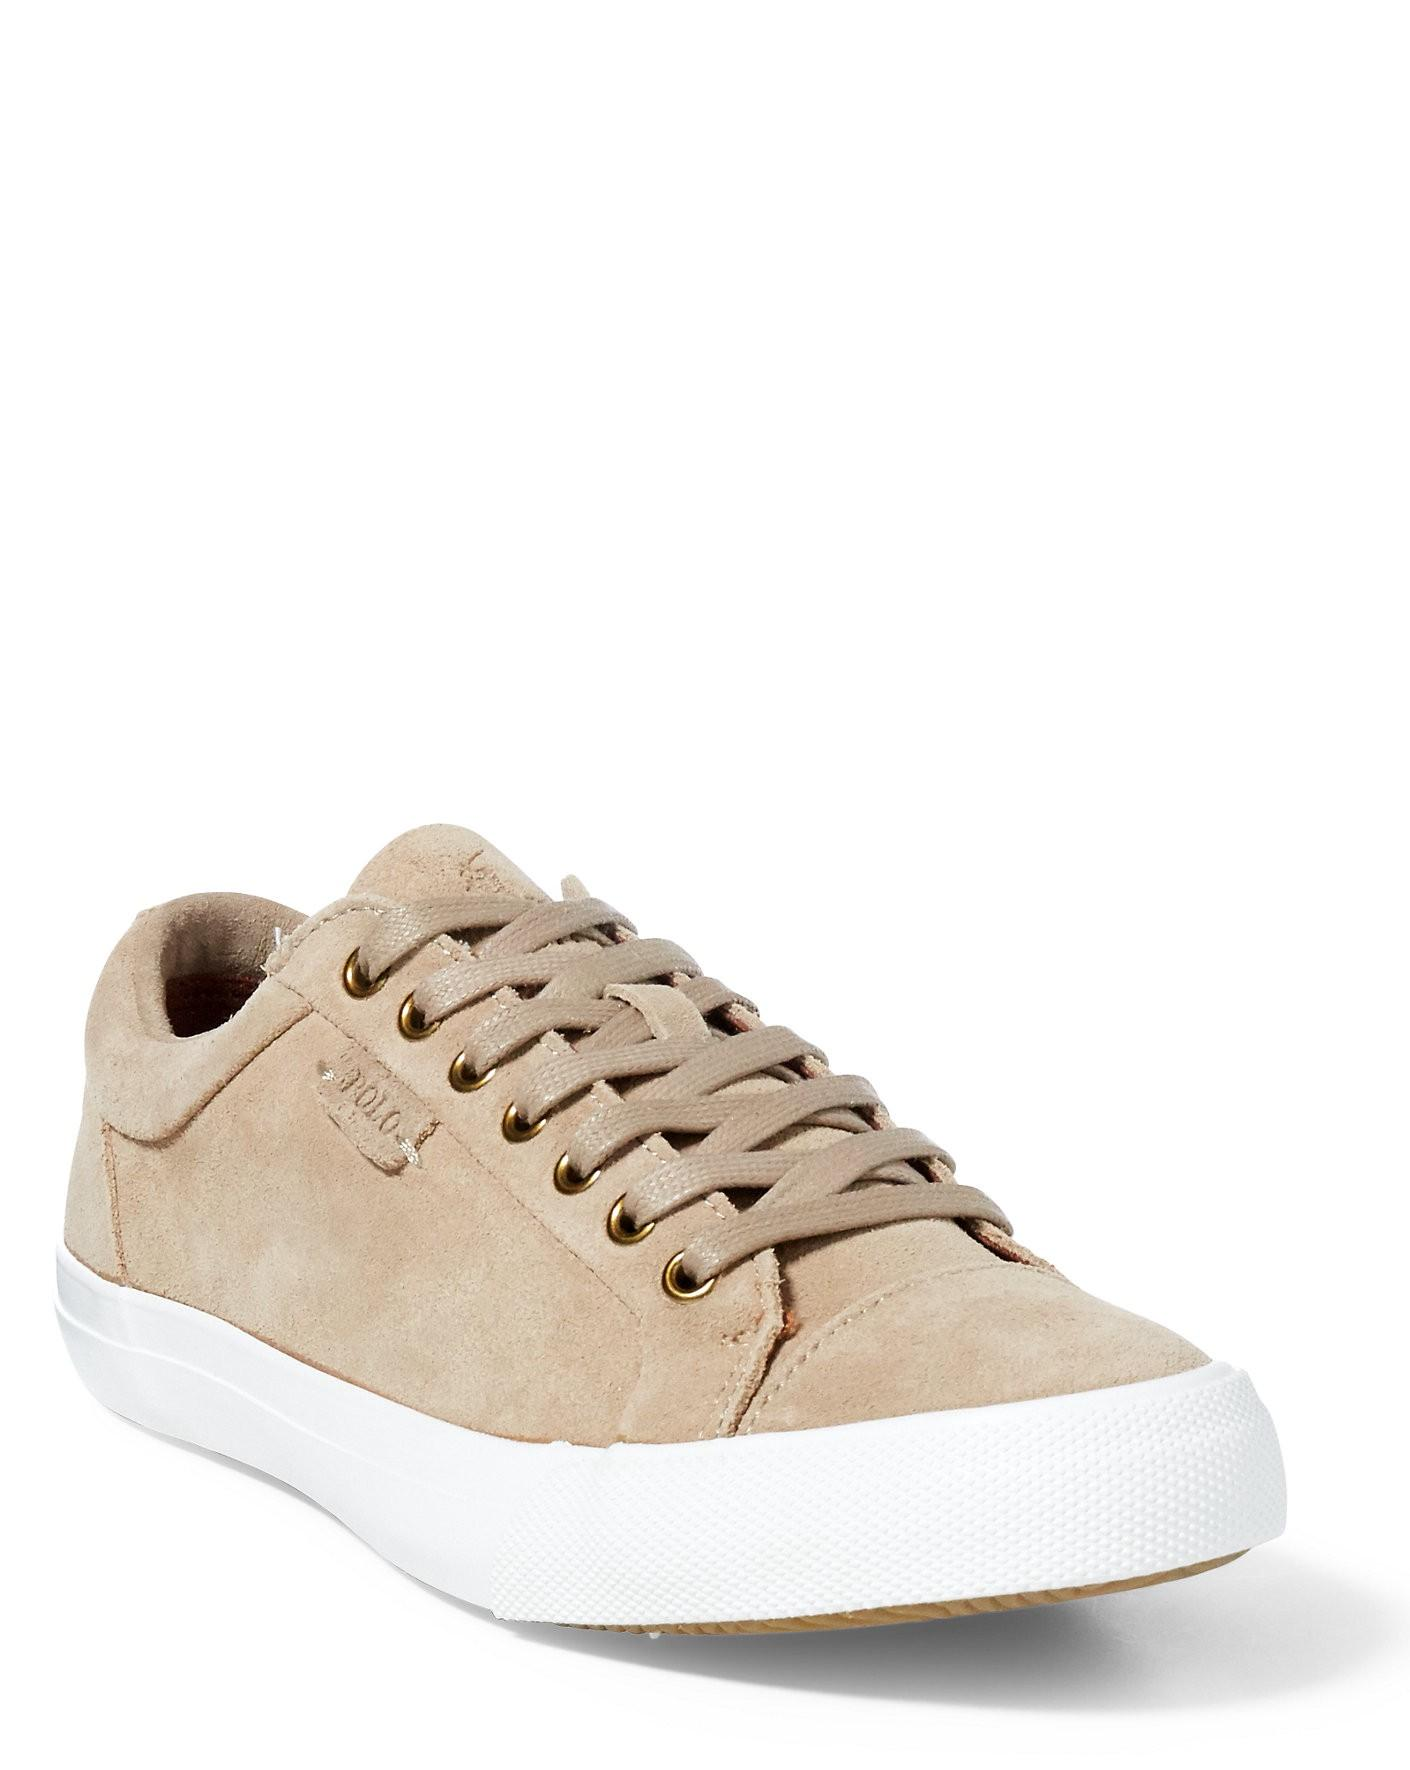 Moral education Decision Pelmel  Ralph Lauren Polo Geffrey Suede Low-top Sneaker In Tan | ModeSens